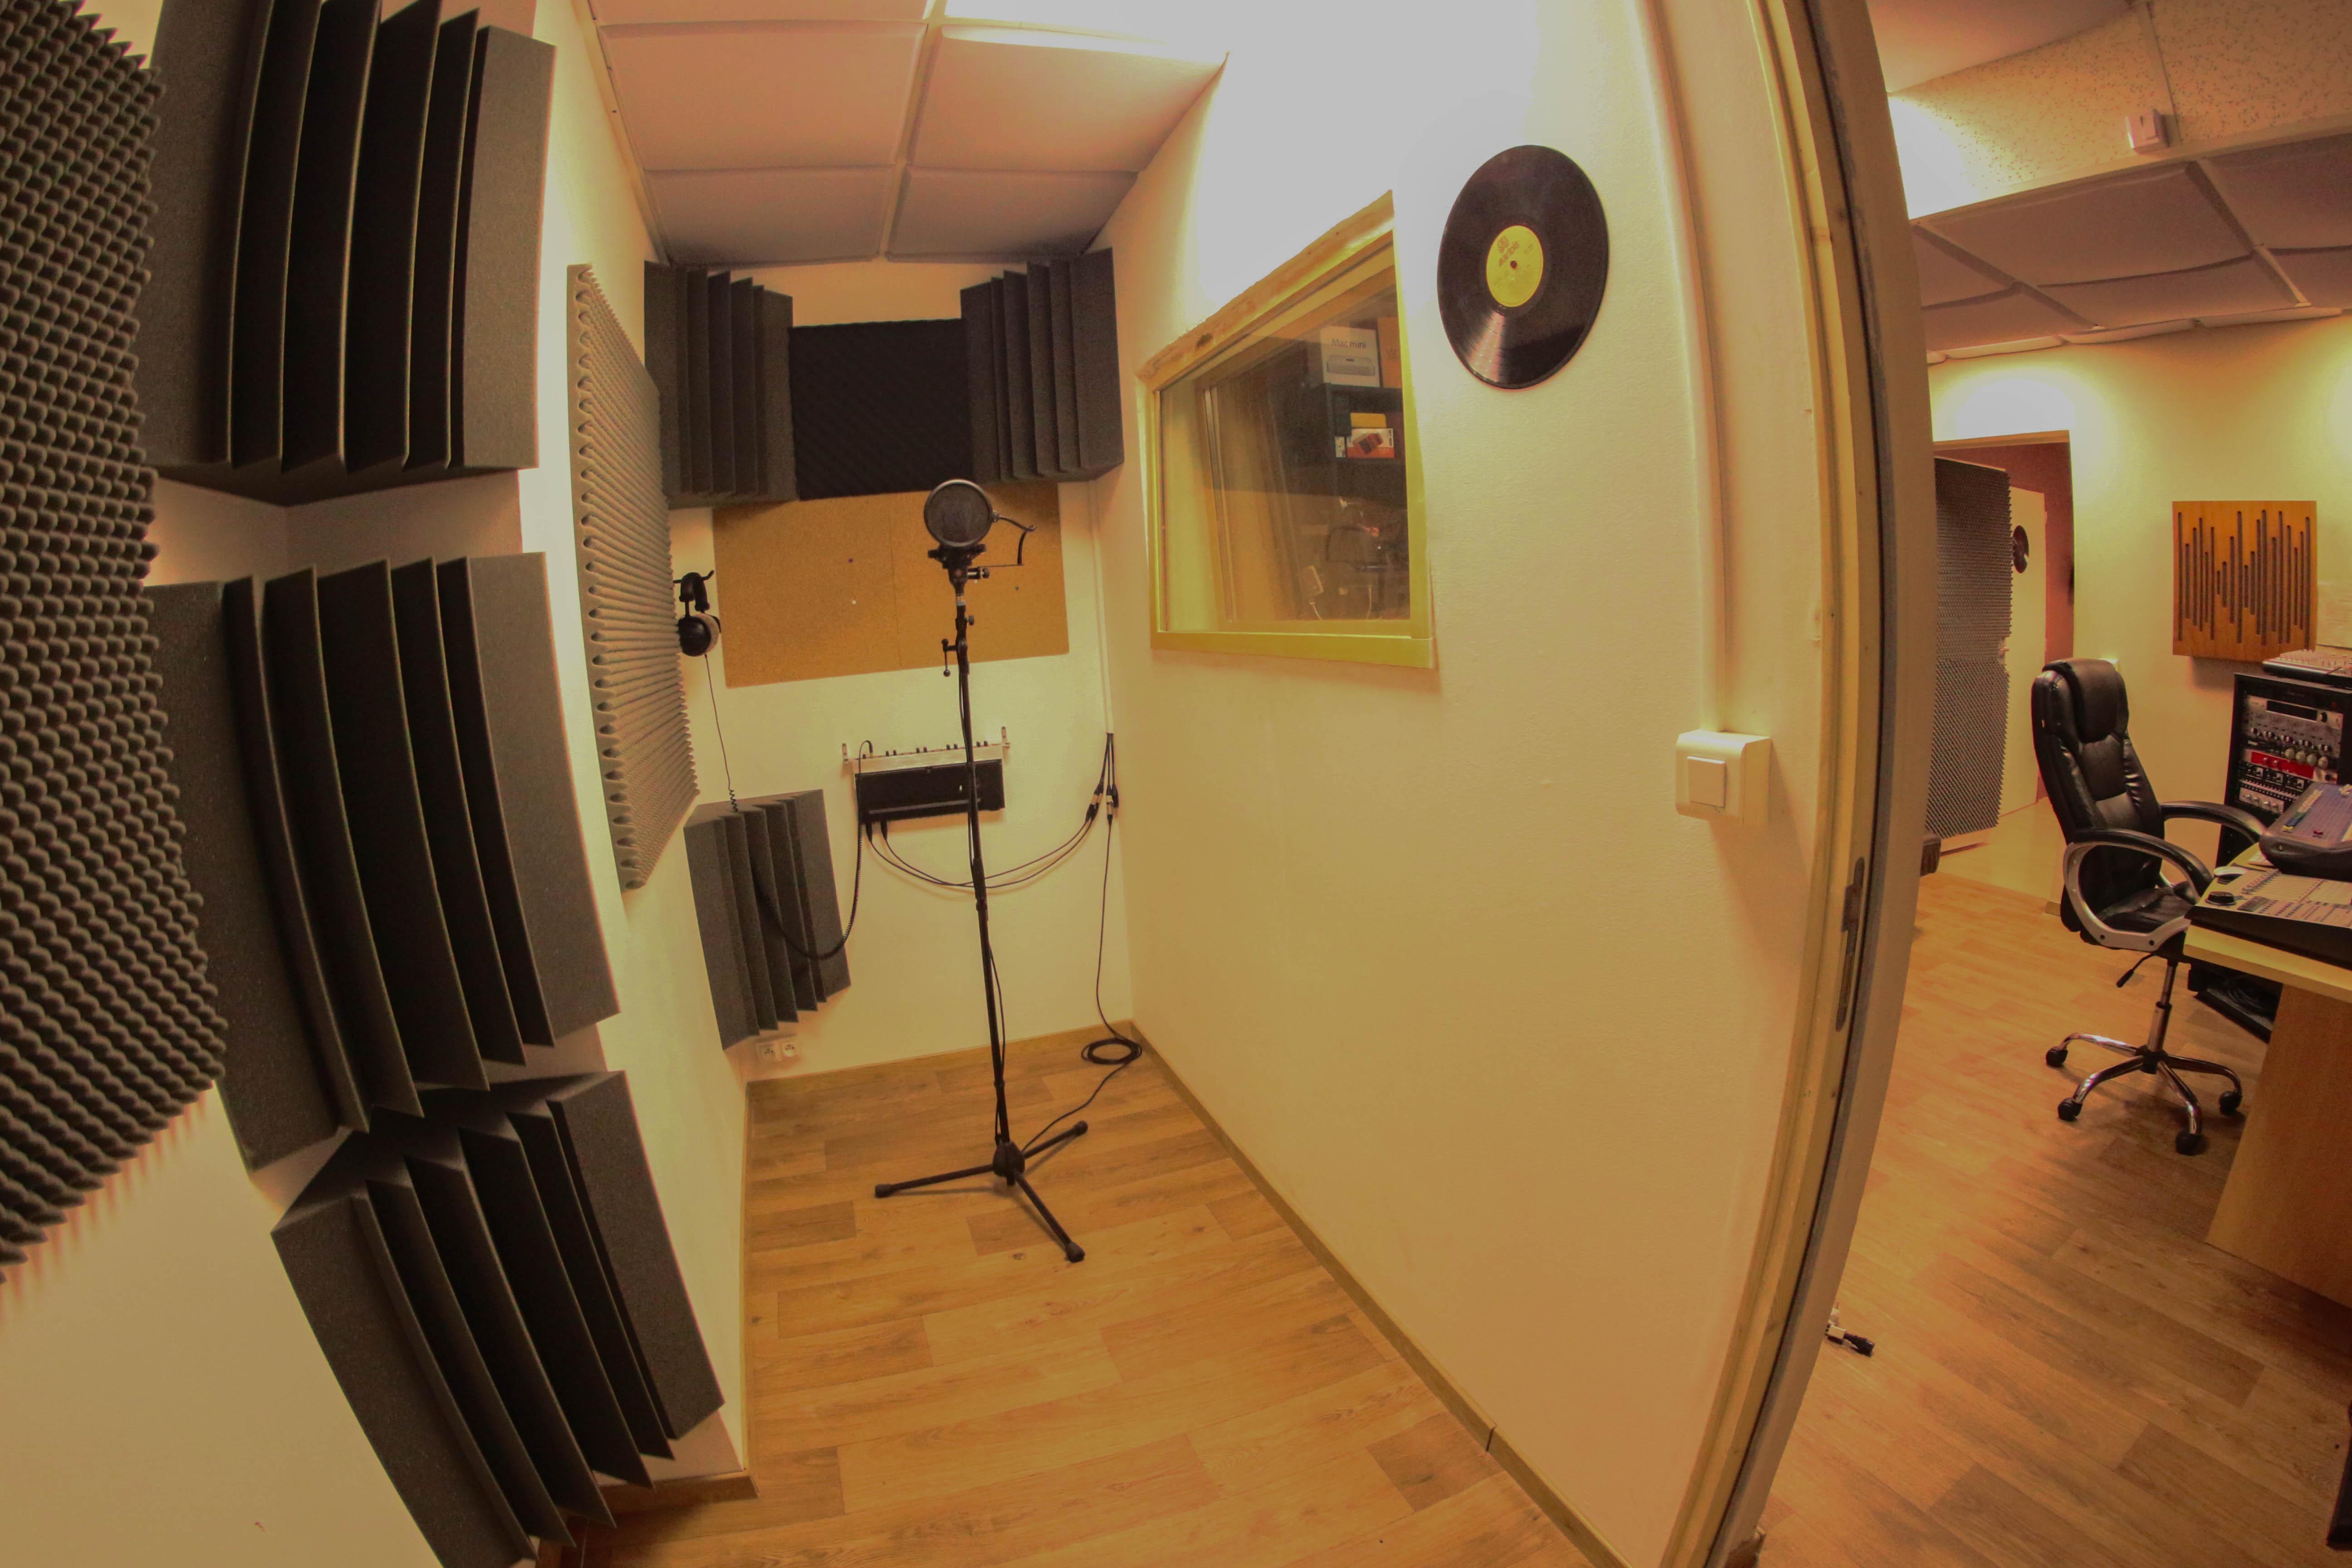 salles et acoustique studio replug. Black Bedroom Furniture Sets. Home Design Ideas